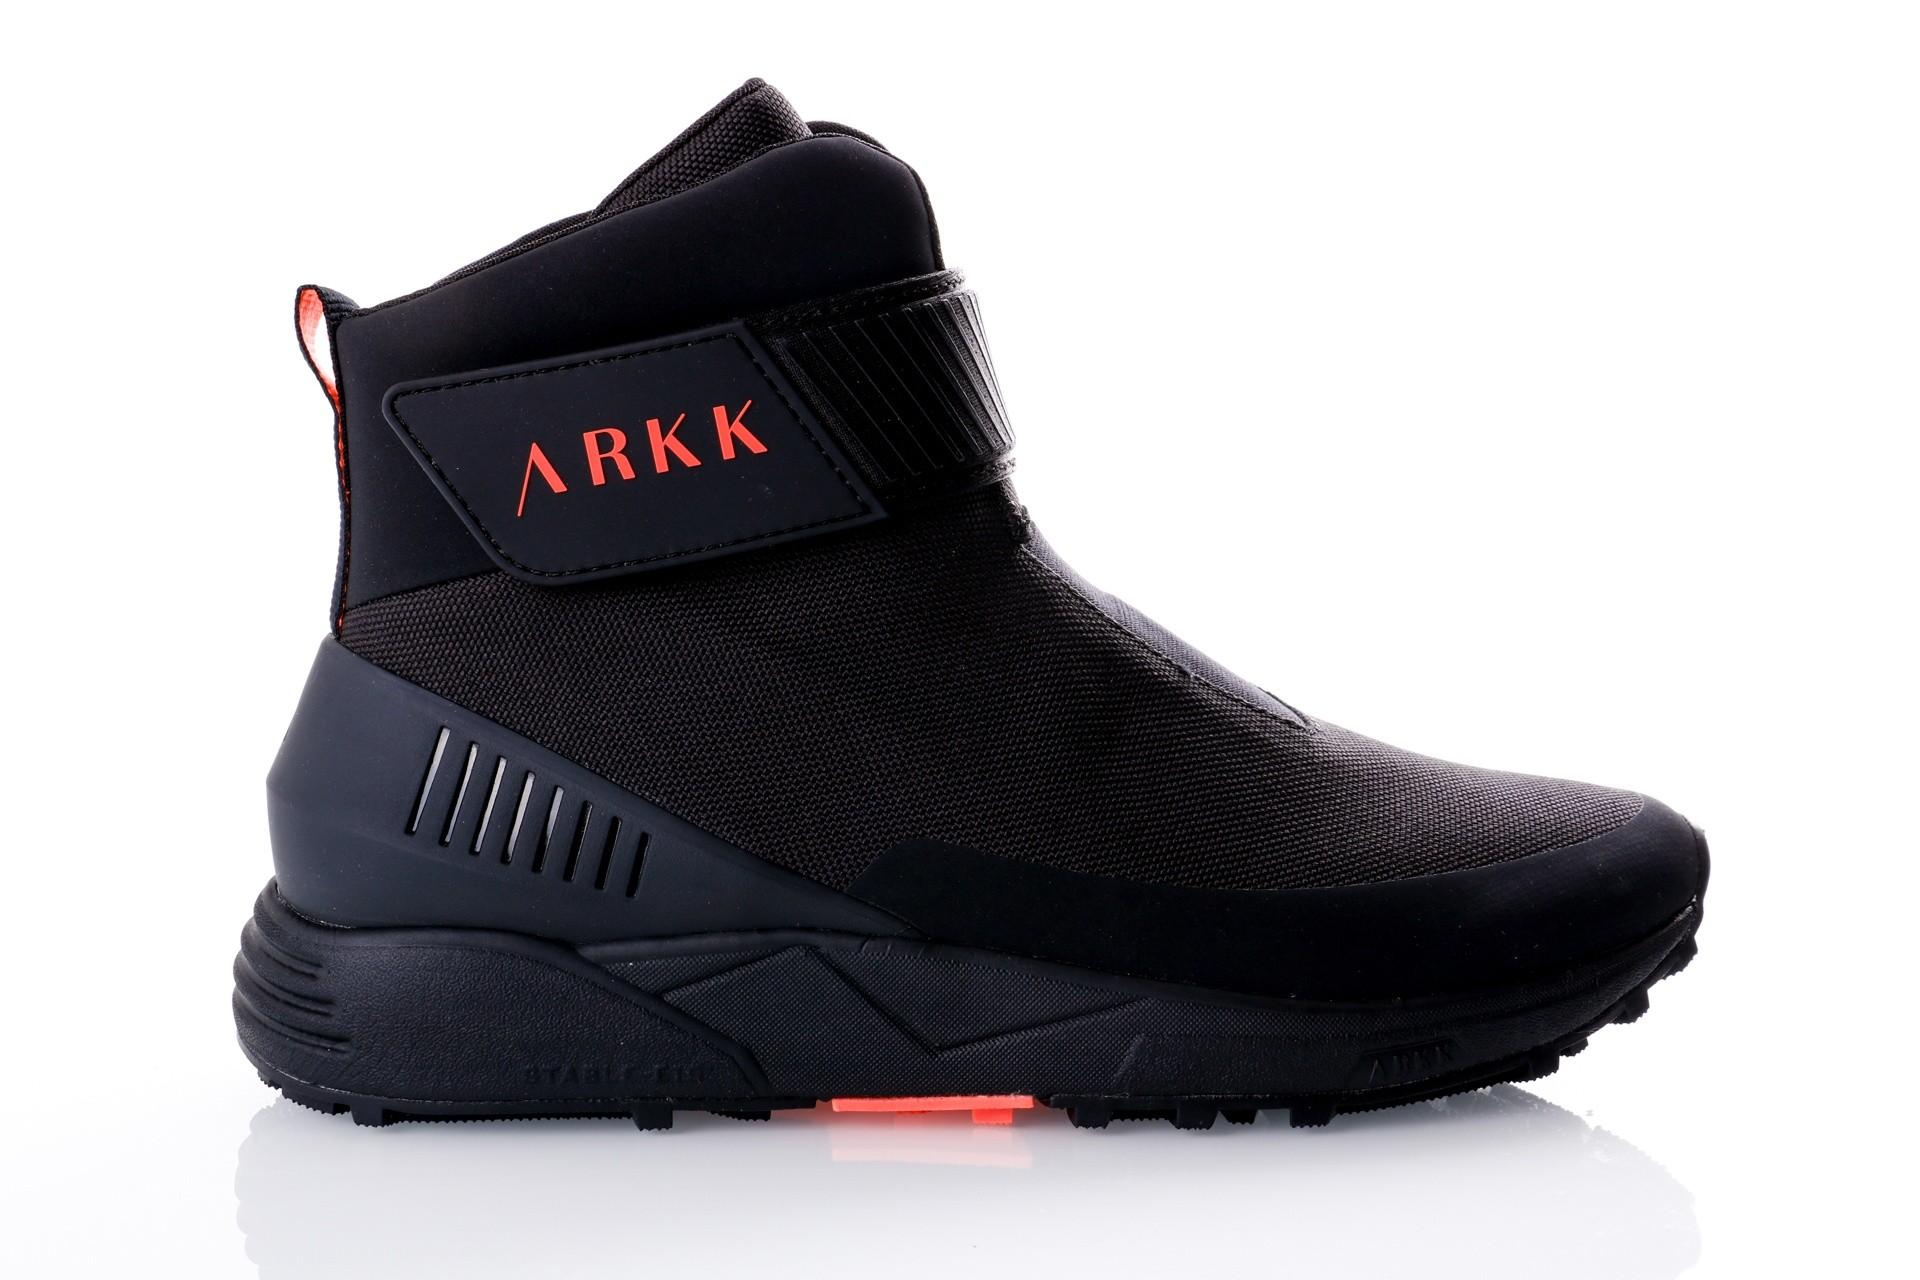 Foto van Arkk Pythron Mesh 2.0 S-E15 Vibram® Black Neon Coral-M ML1905-9908-M Sneakers Black